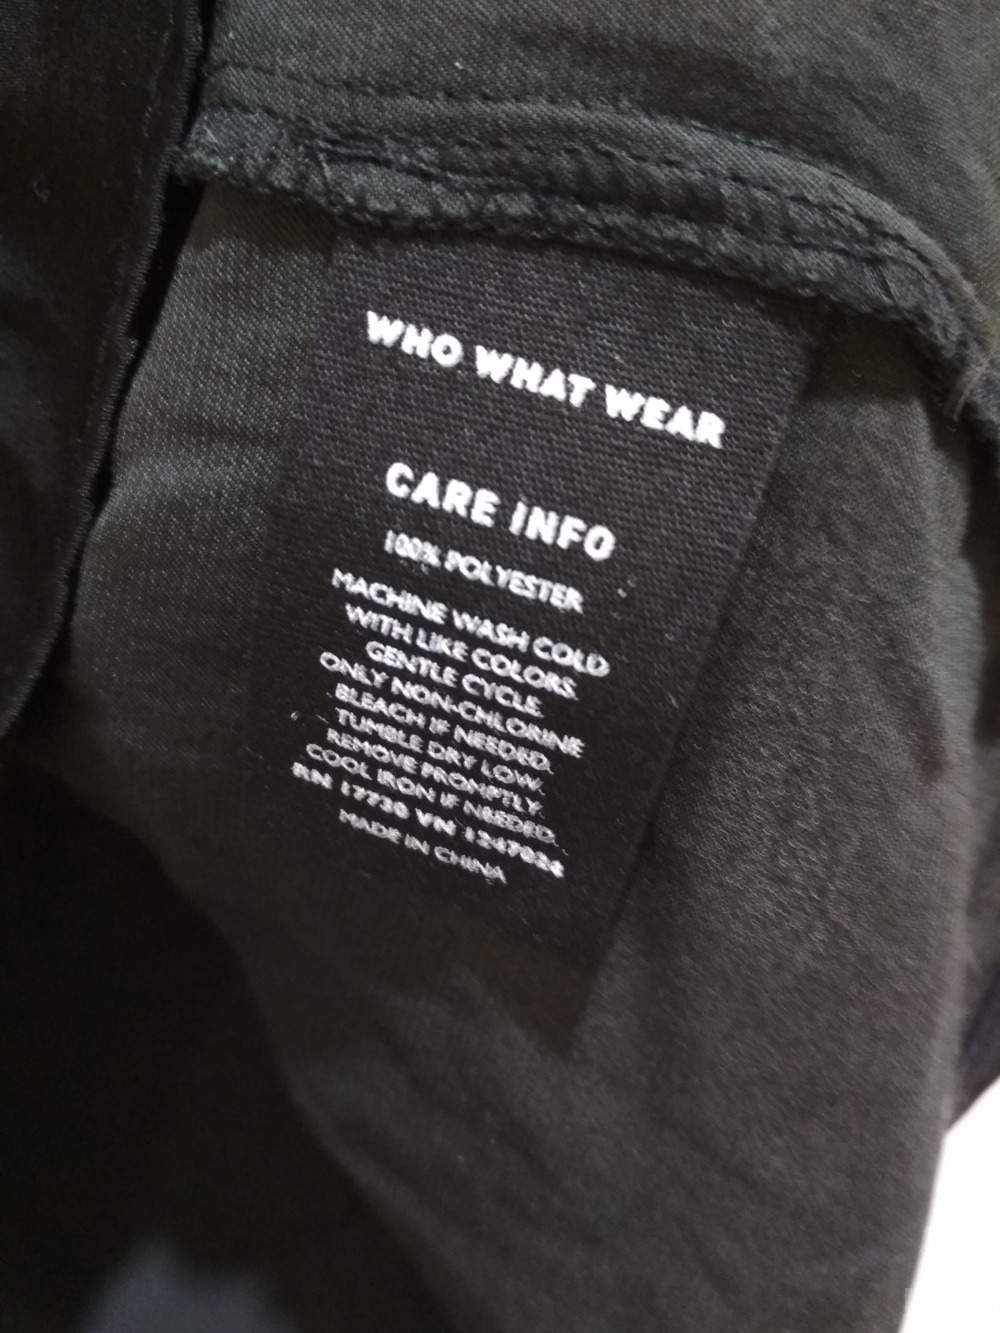 Блузка who what wear размер S